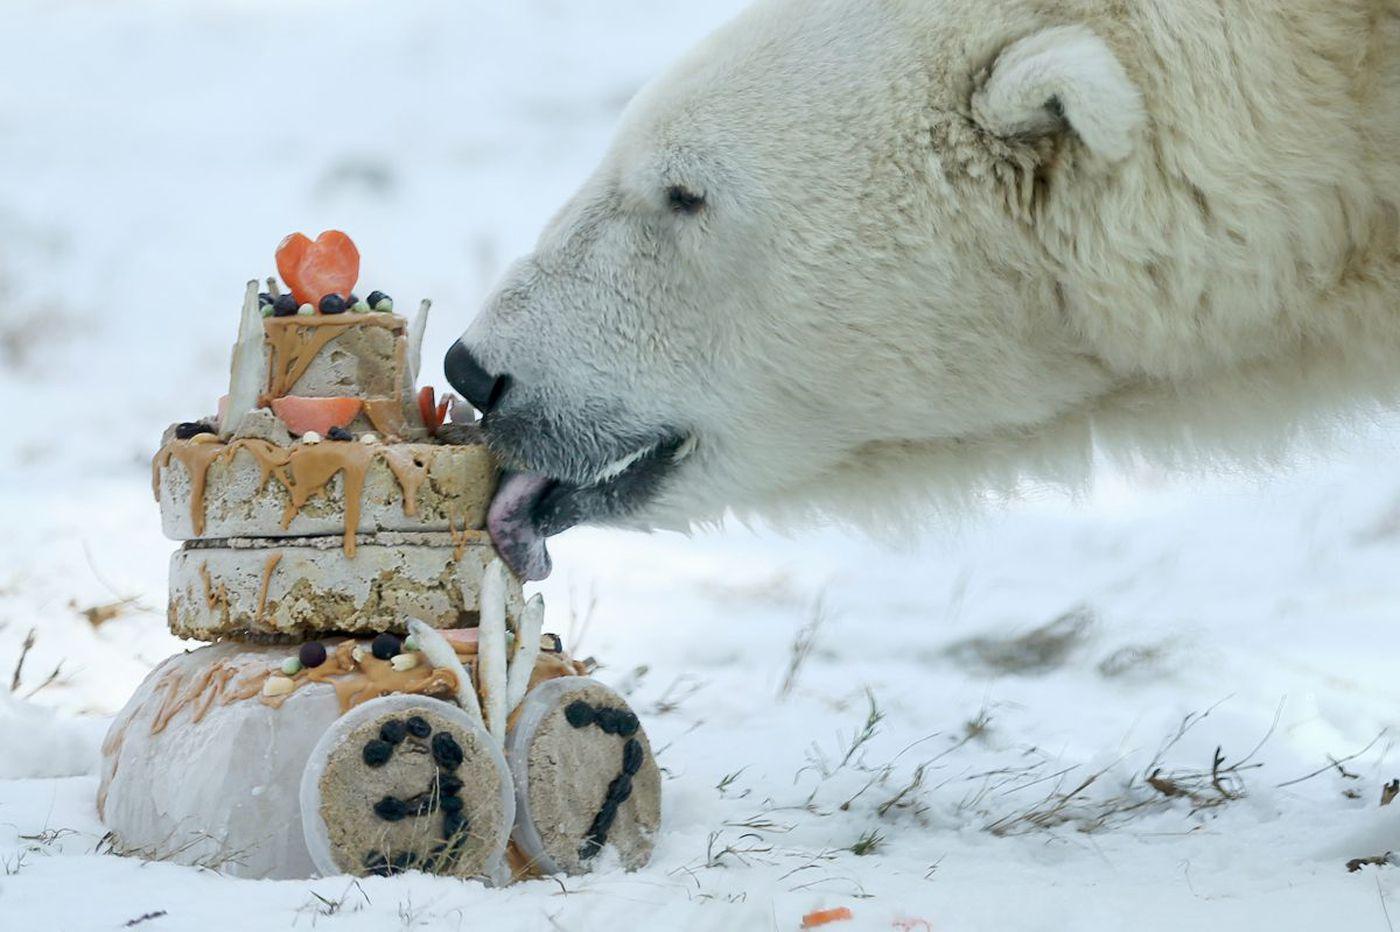 Coldilocks, Philadelphia Zoo polar bear, euthanized after 'serious decline' in health